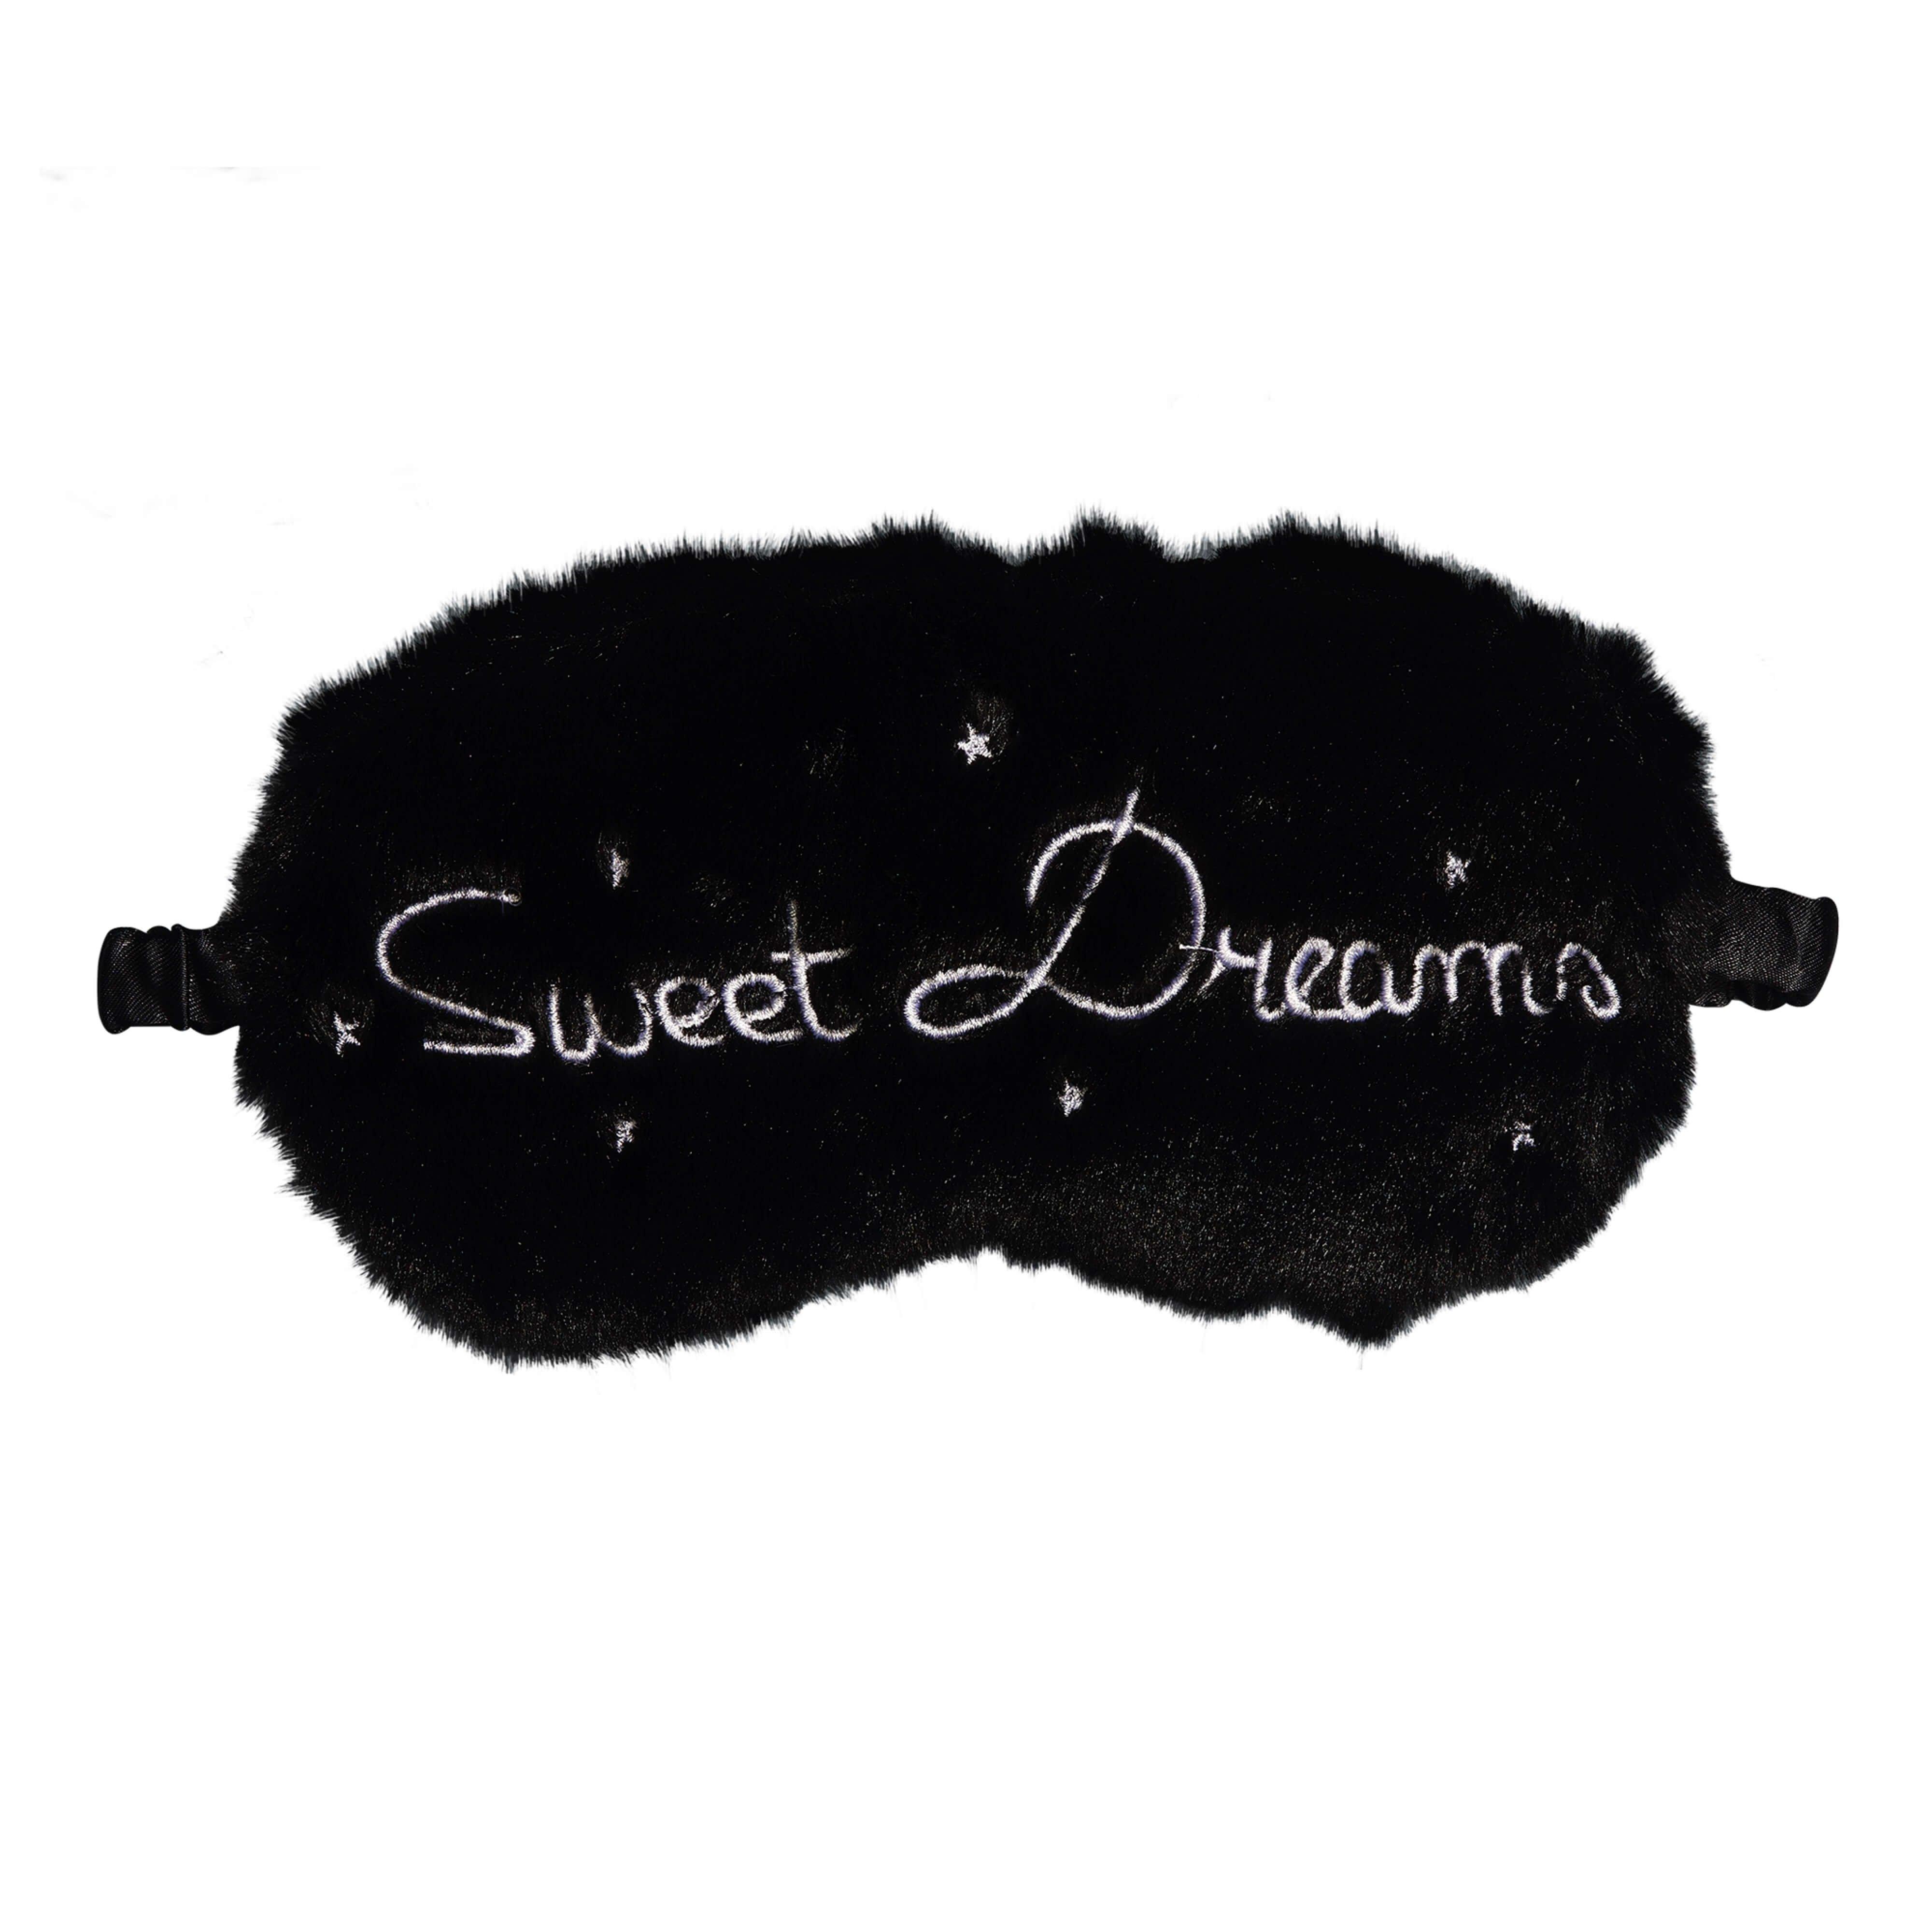 Masque de nuit sweet dreams